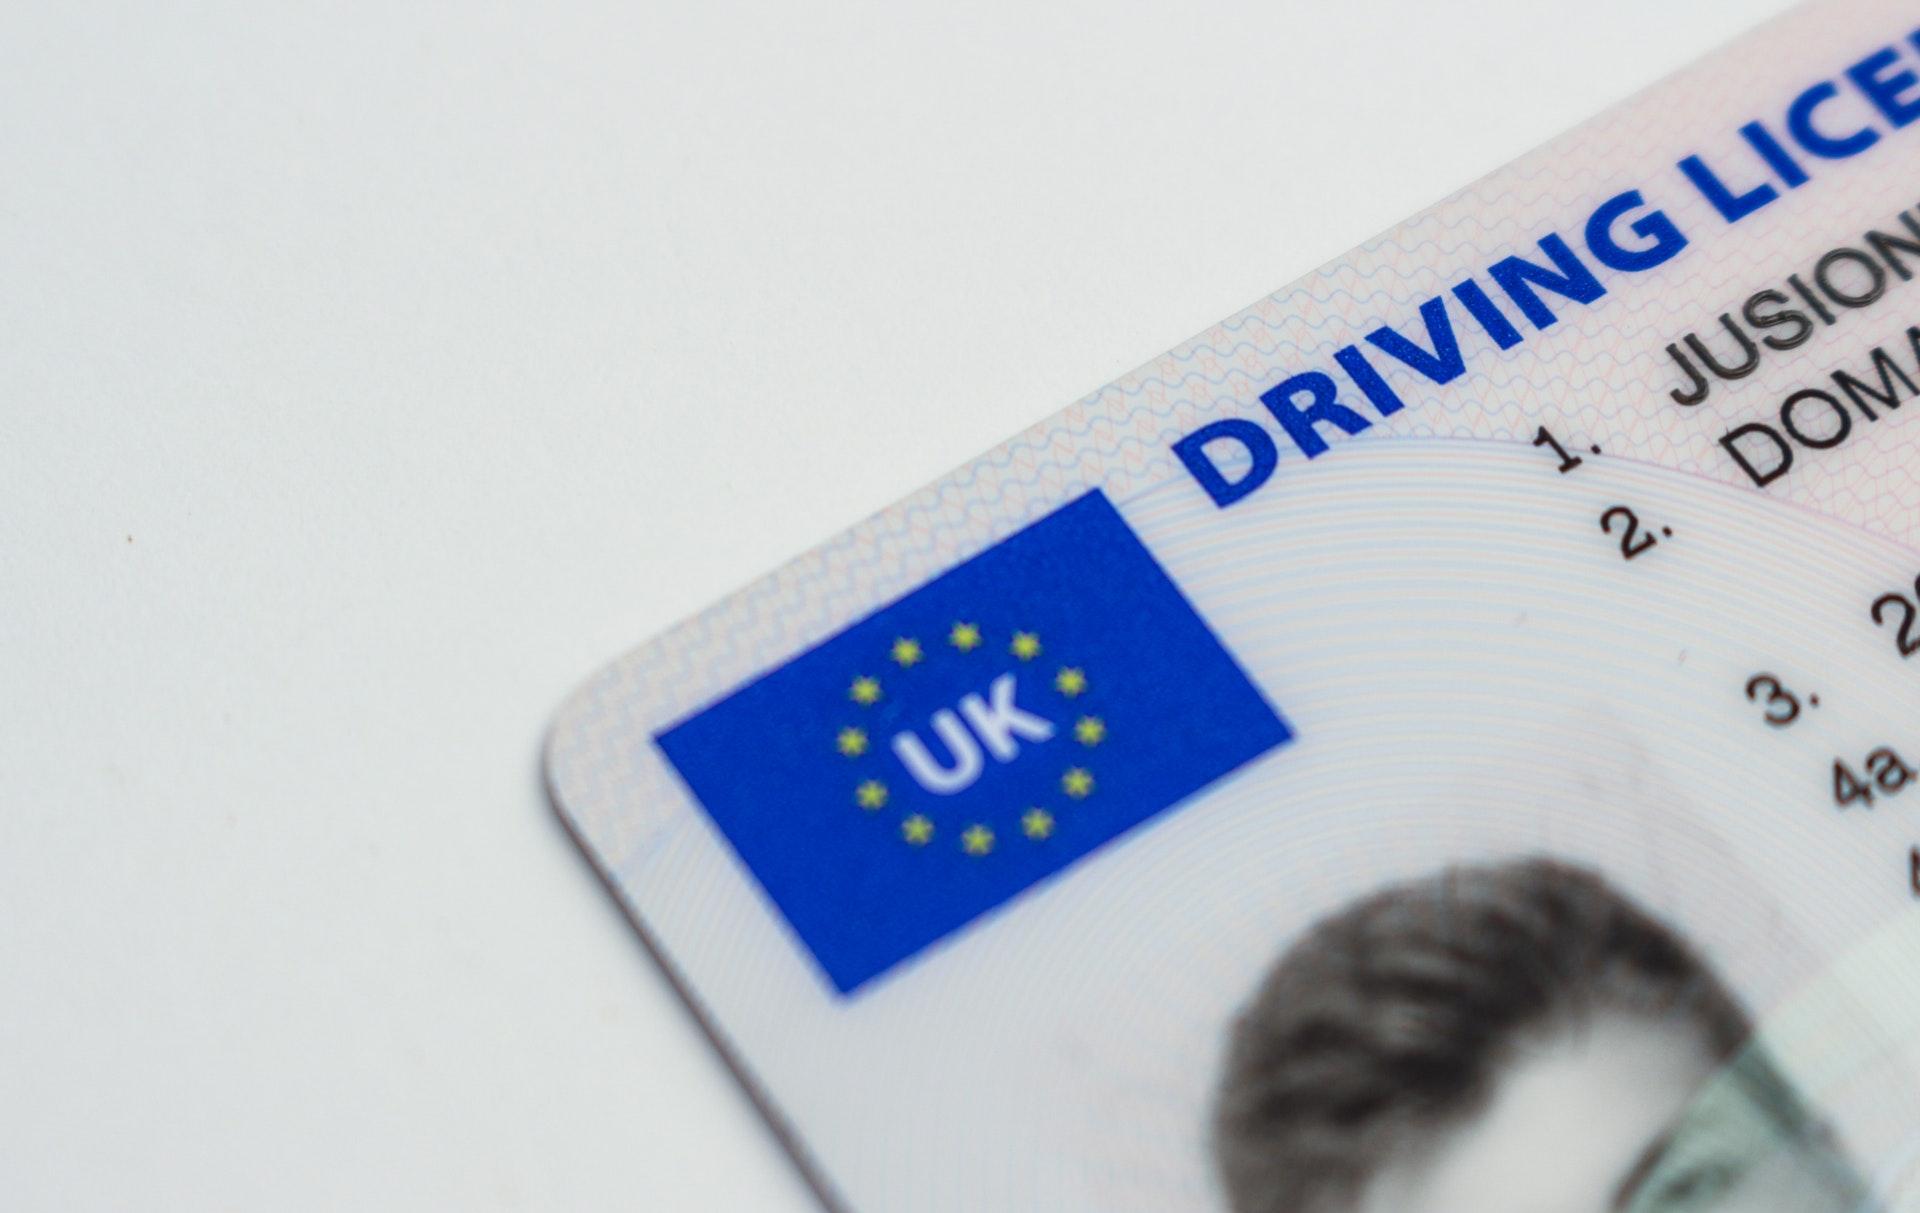 Graduated Licence Scheme Image.jpg (186 KB)